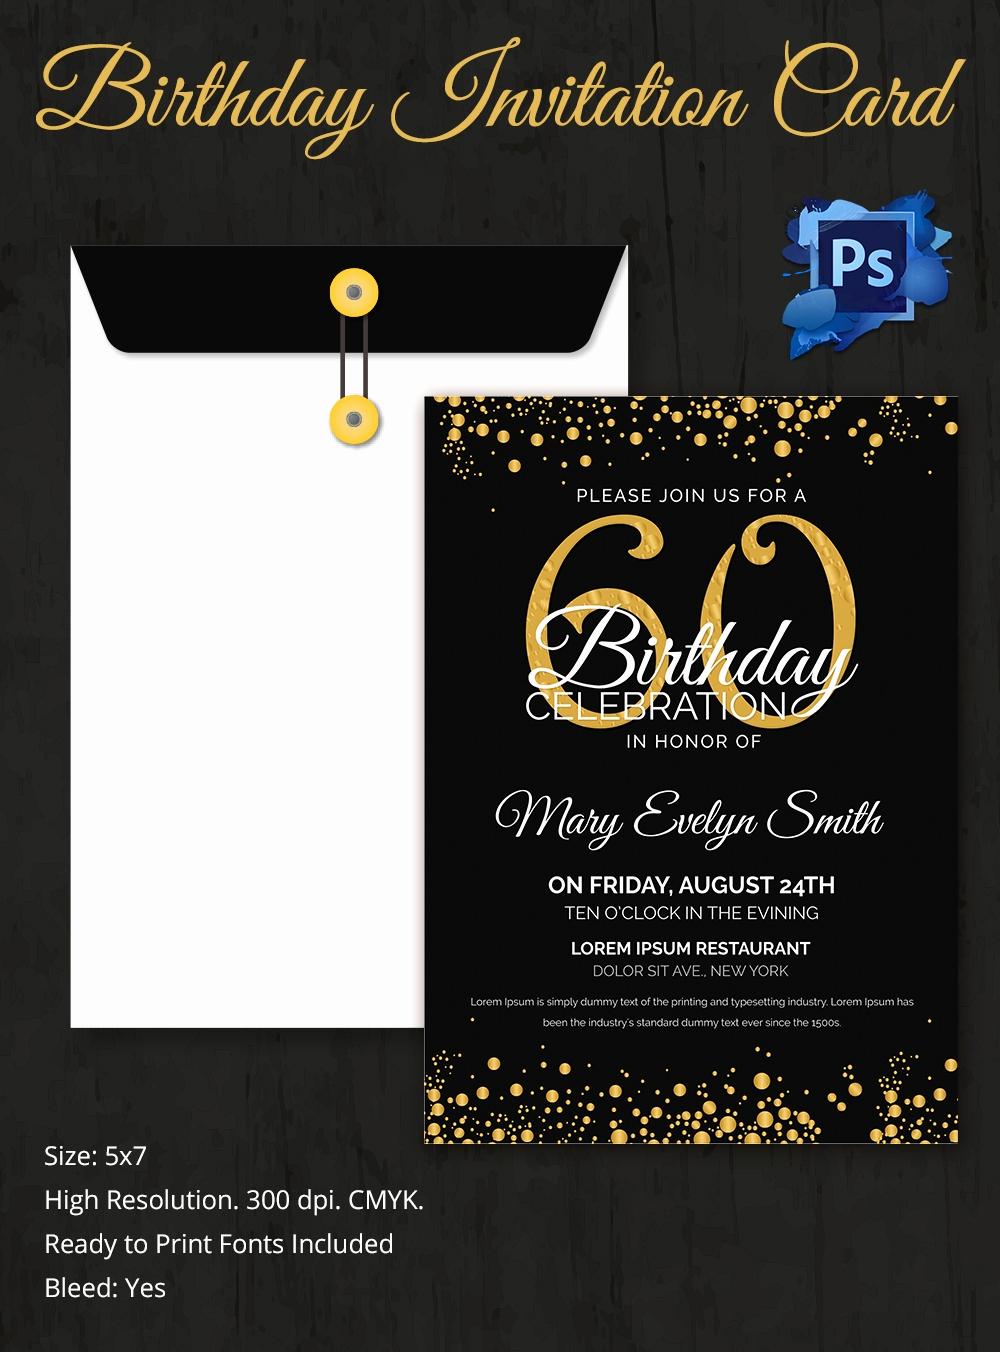 Free Birthday Party Invitation Templates Lovely Birthday Invitation Template 32 Free Word Pdf Psd Ai